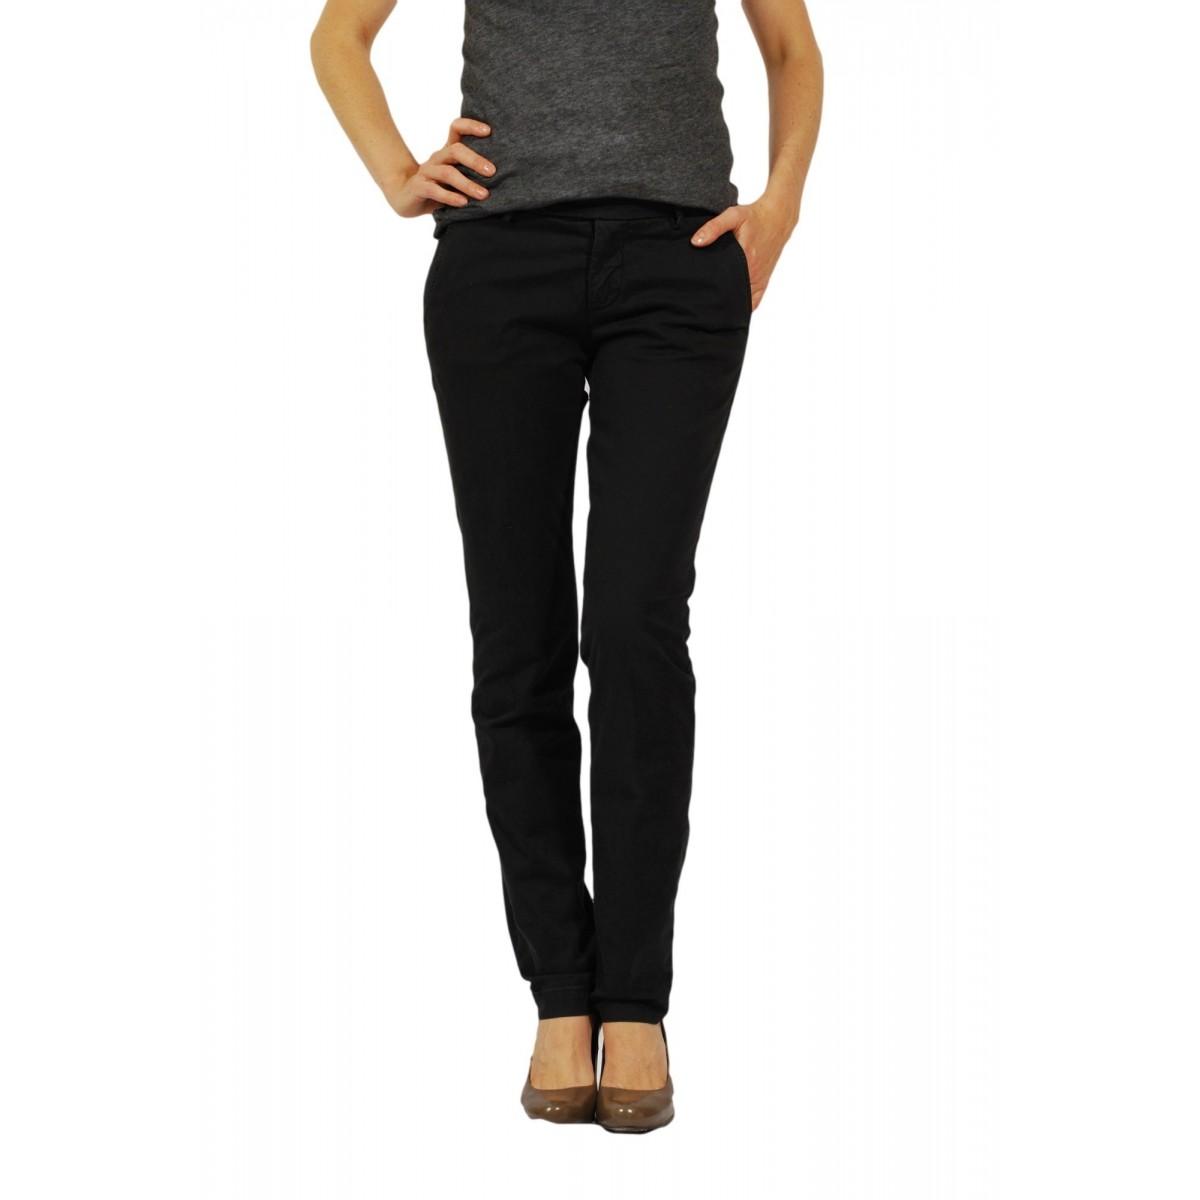 Pantalone Roy Rogers Donna - Roxanna Gab Mid Strech 37